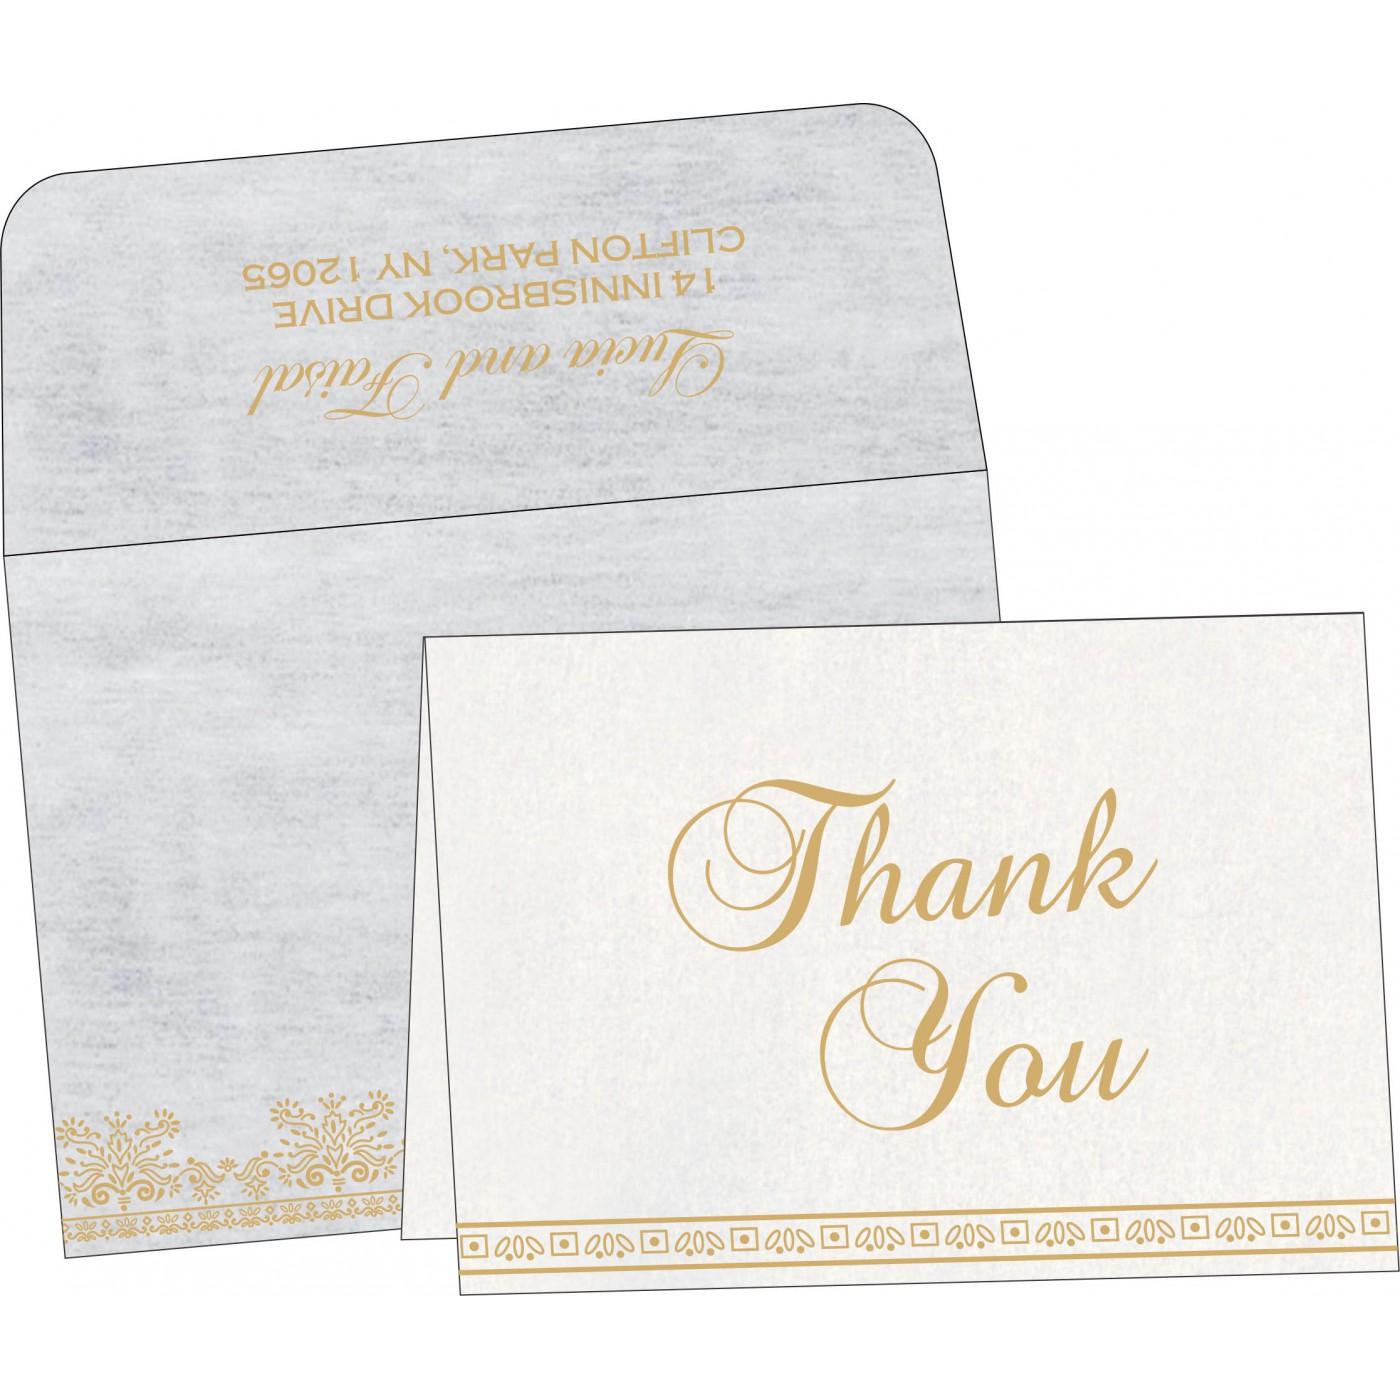 Thank You Cards : TYC-8241A - 123WeddingCards